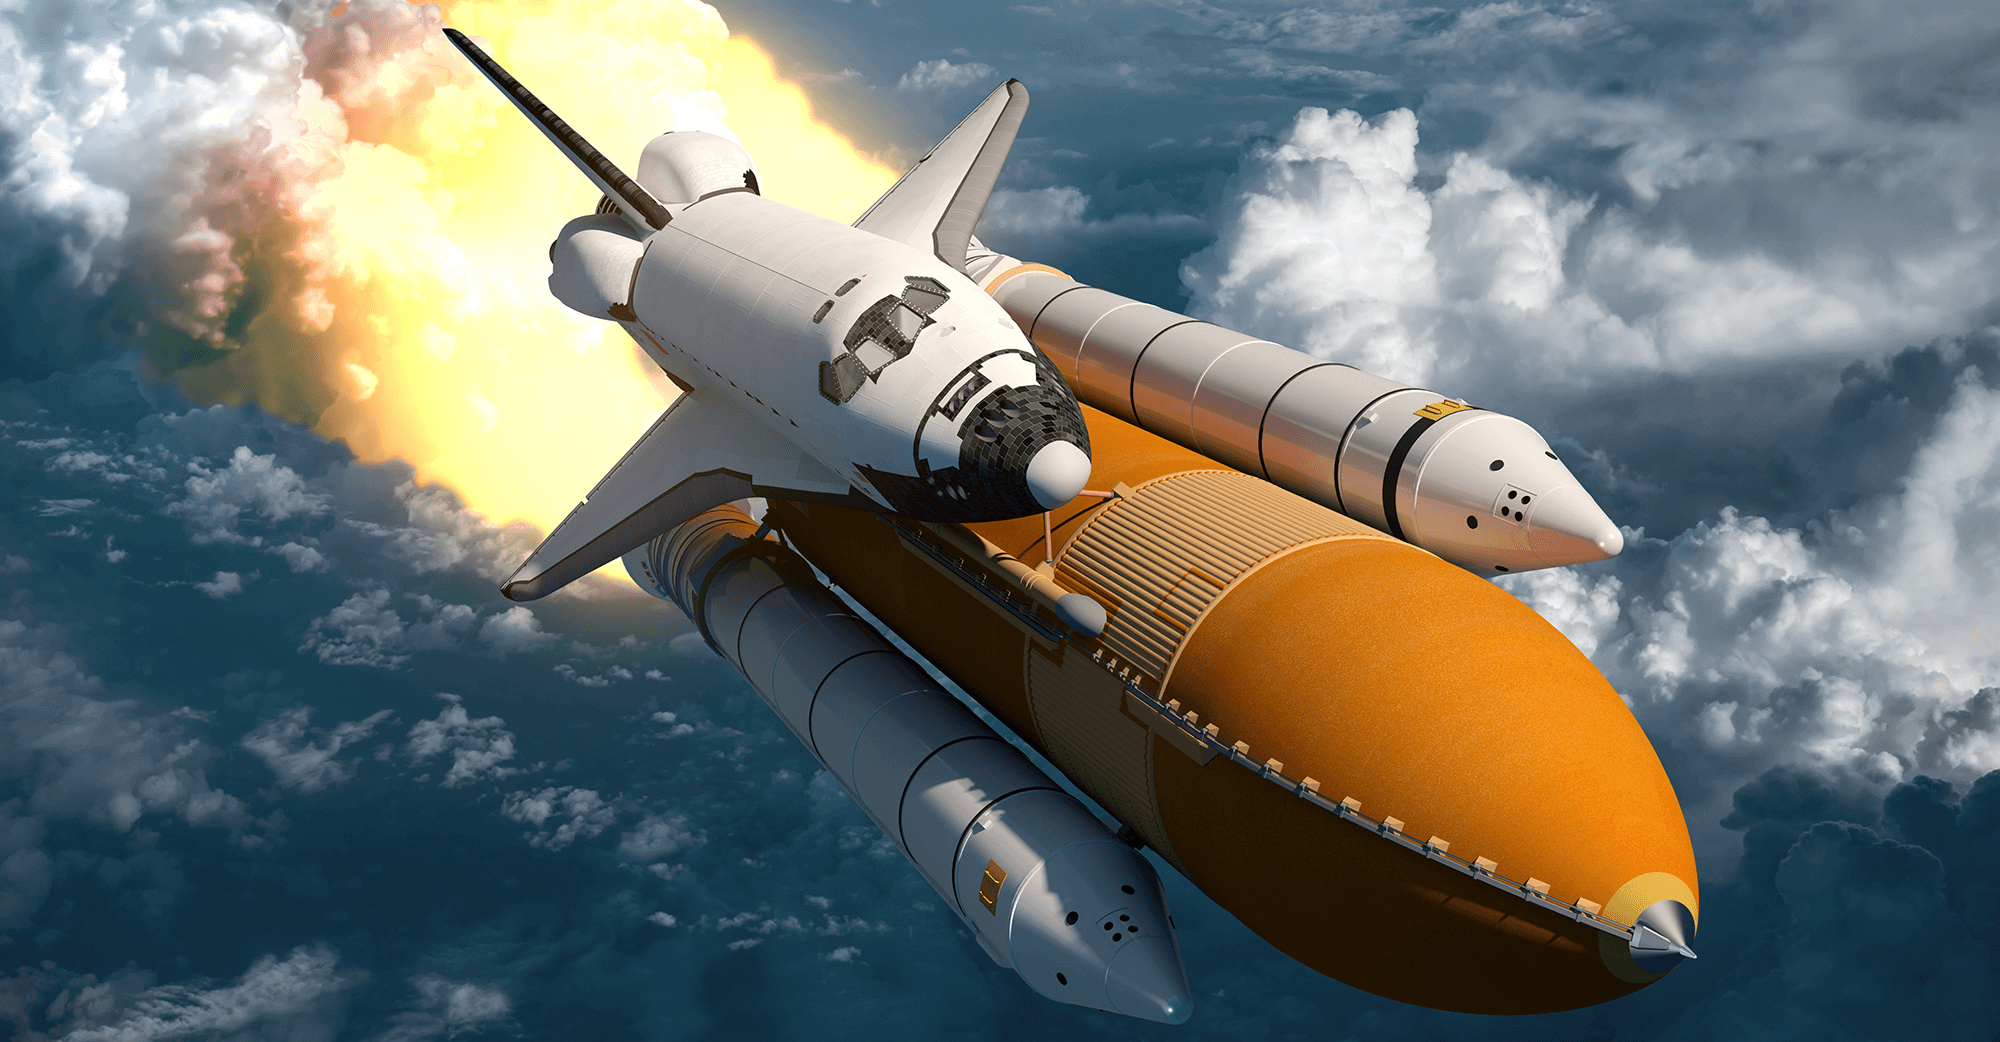 Rocket-booster